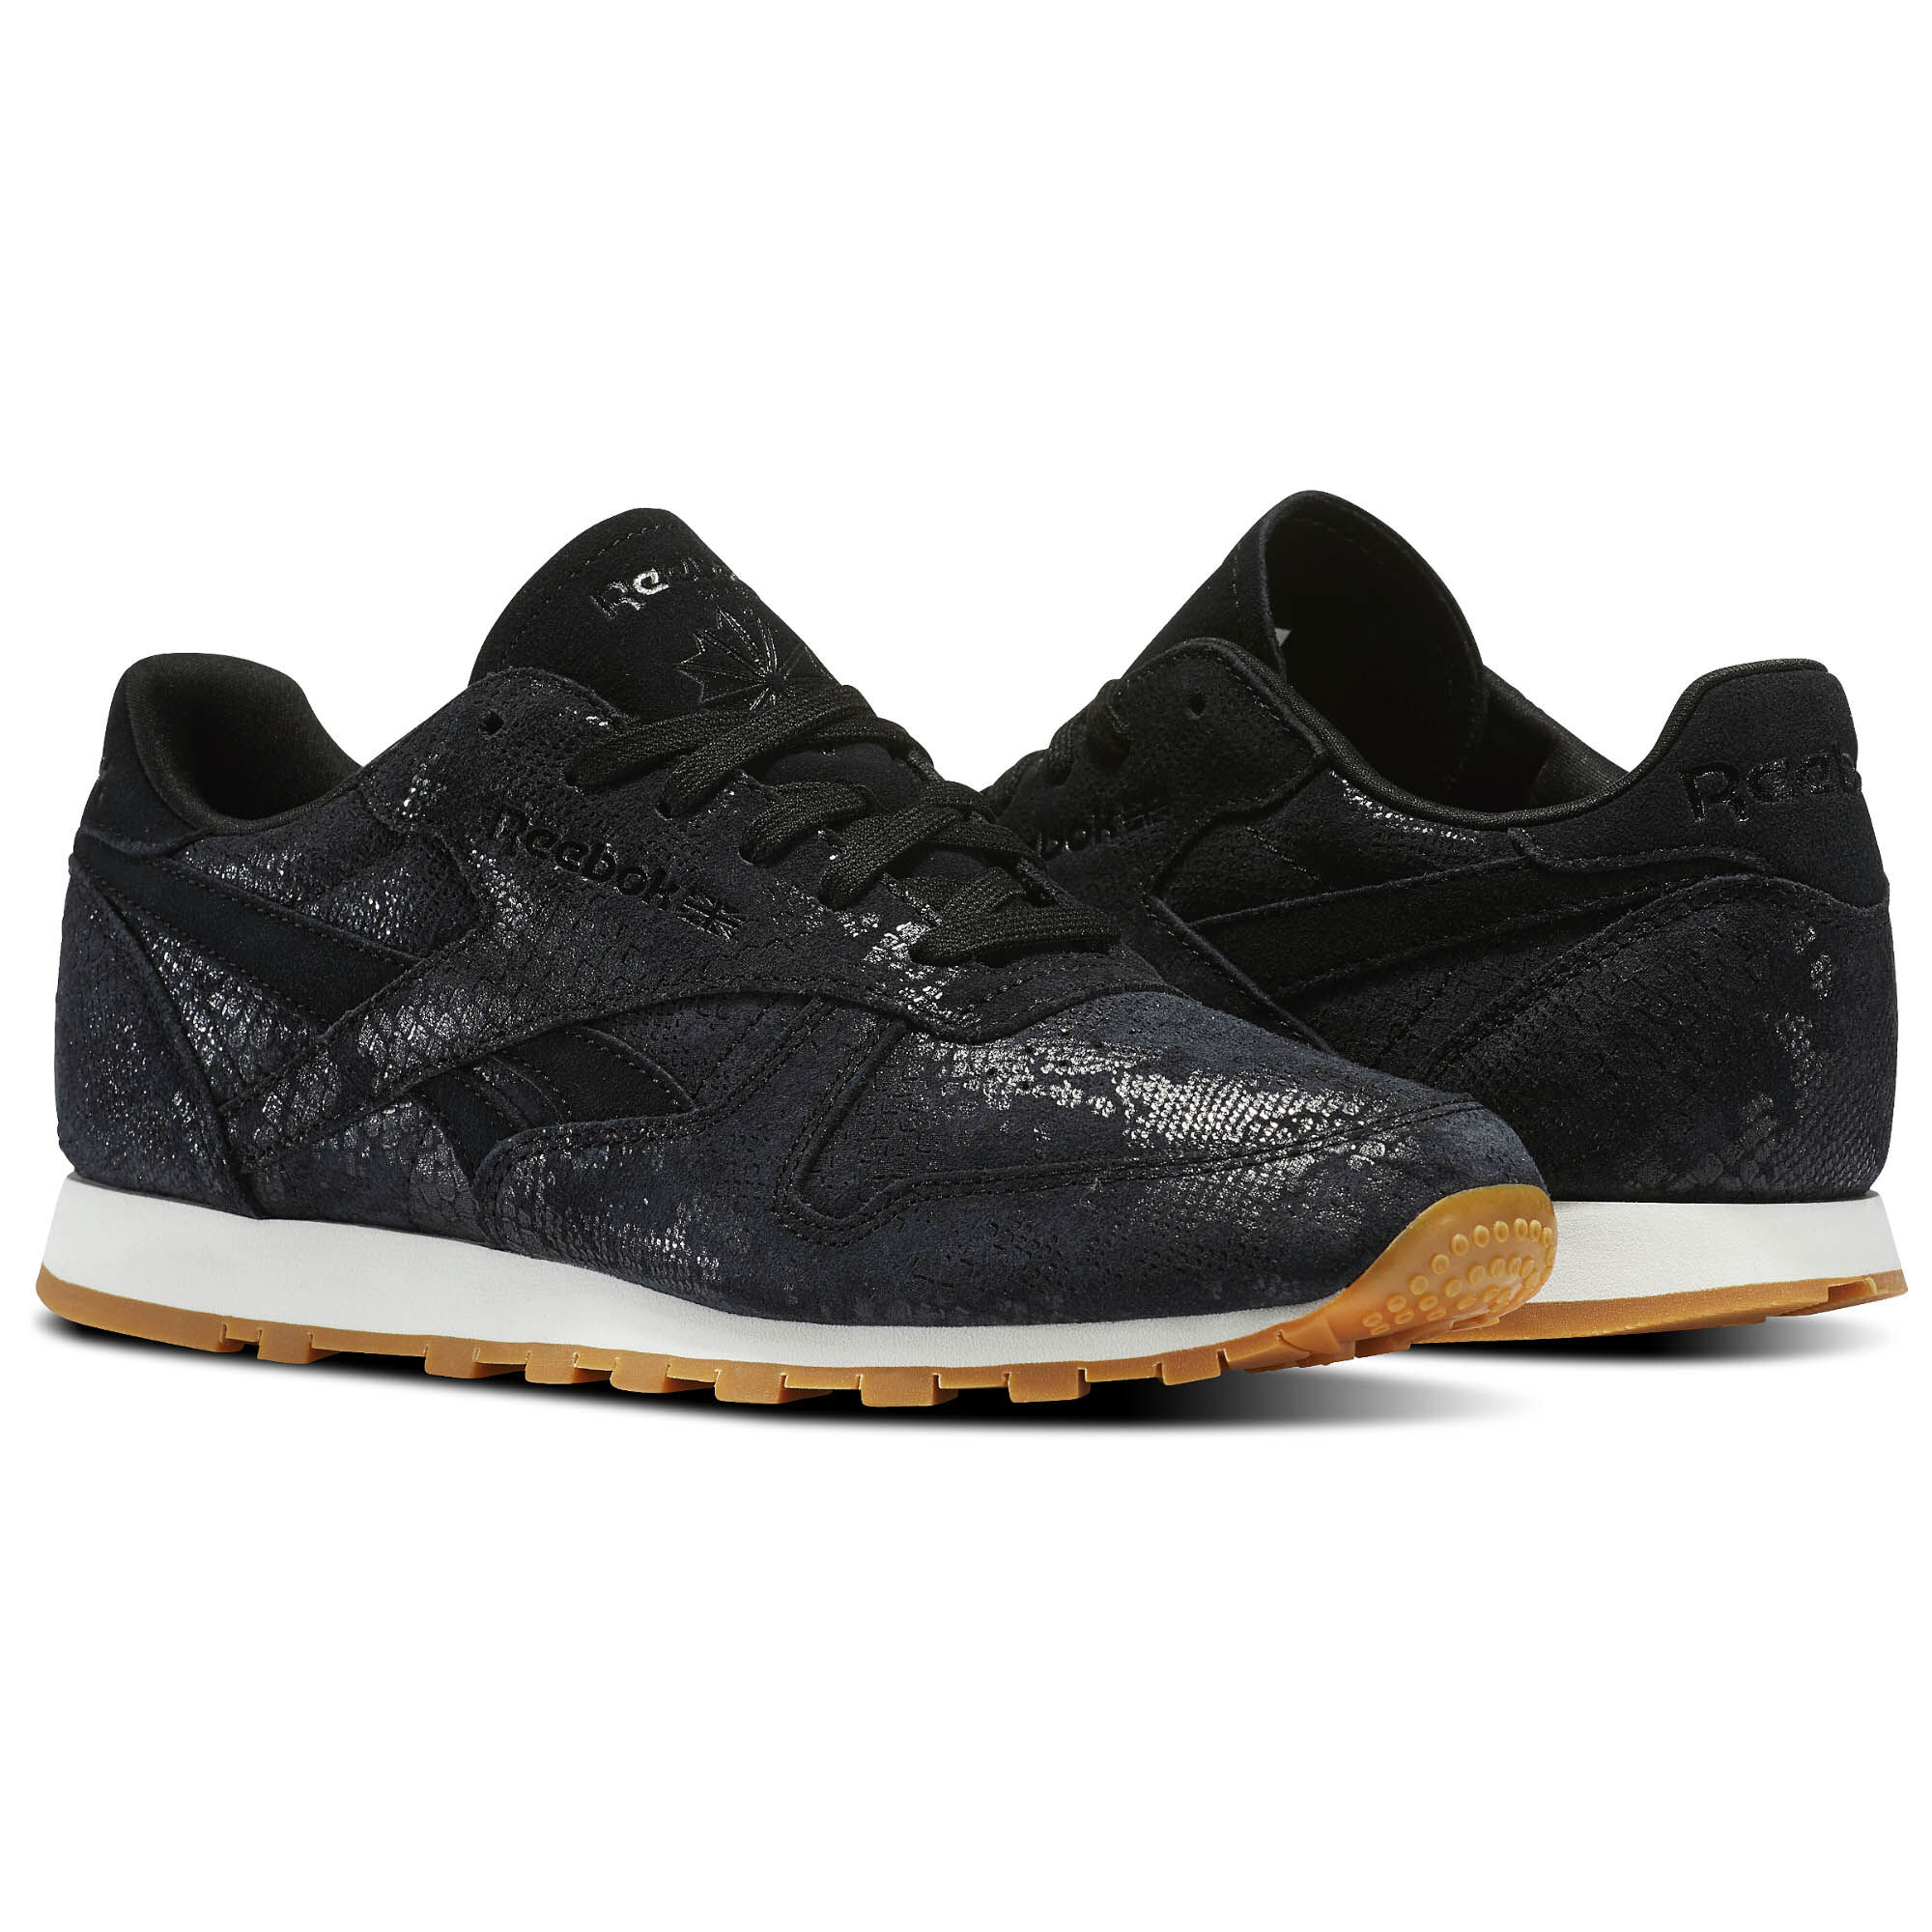 Reebok - Classic Leather Clean Exotics Black/Chalk/Gum BS8229